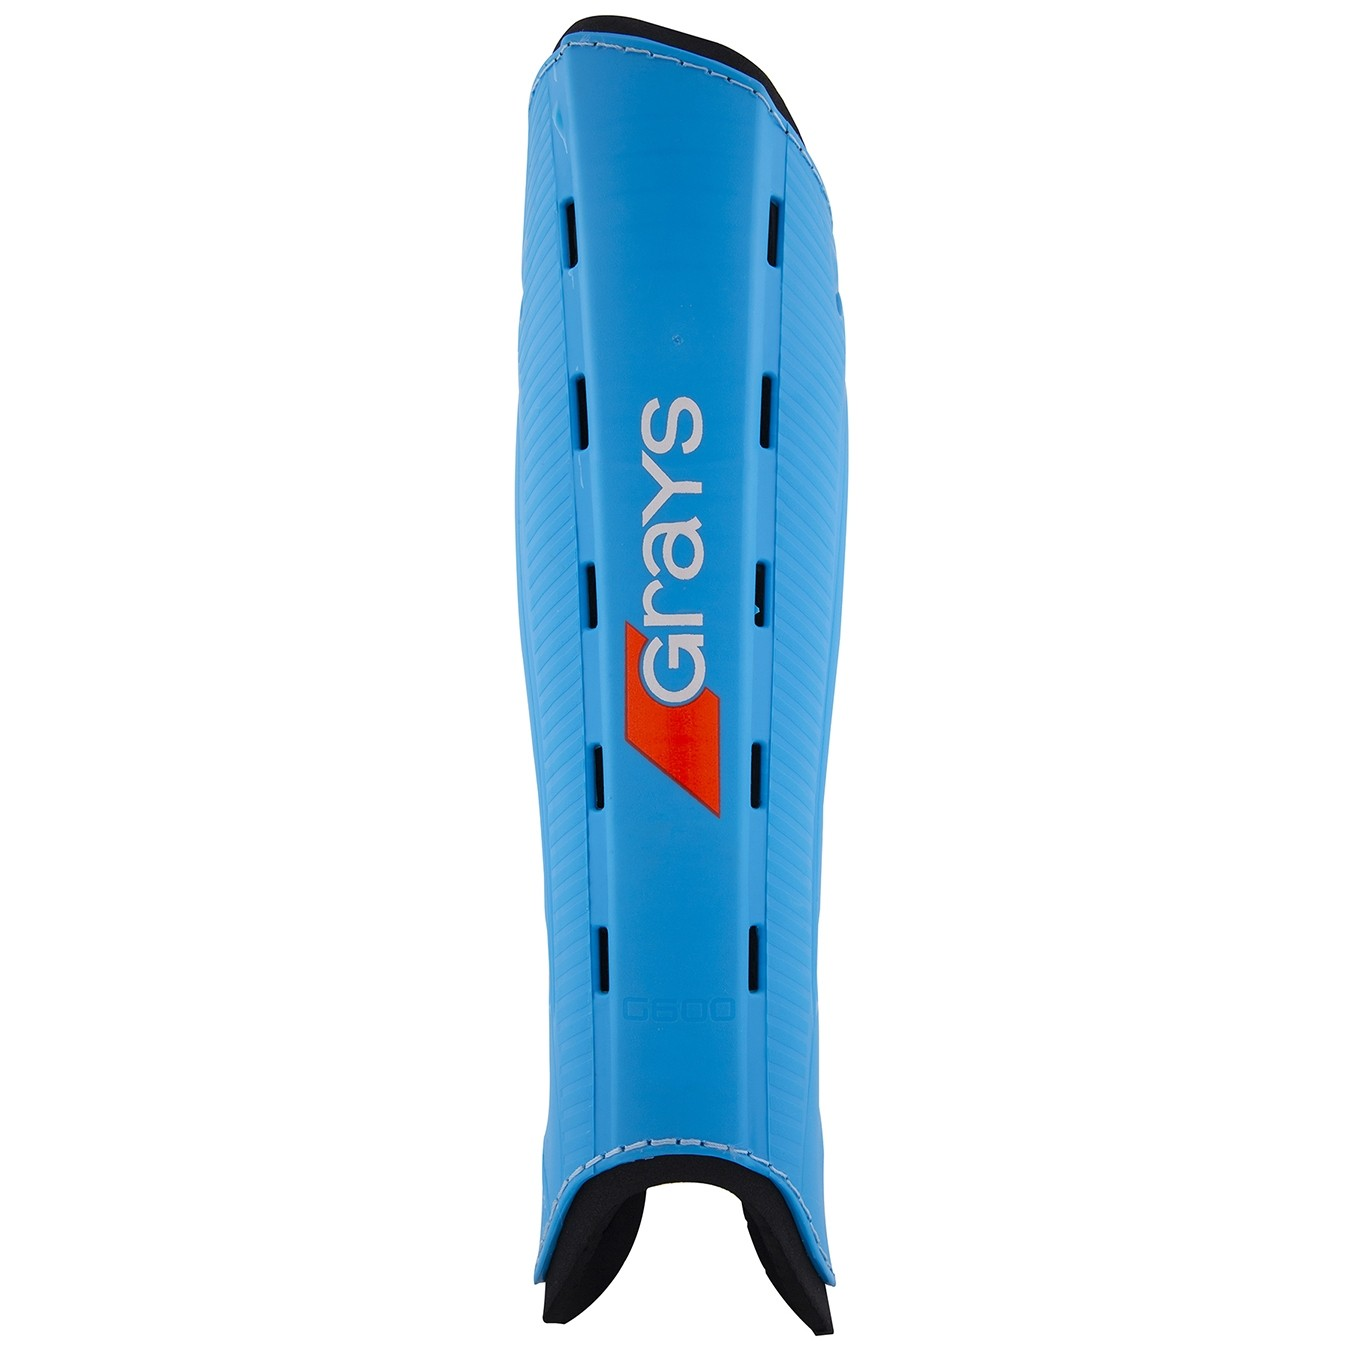 2021/22 Grays G600 Hockey Shinguard - Blue/Black